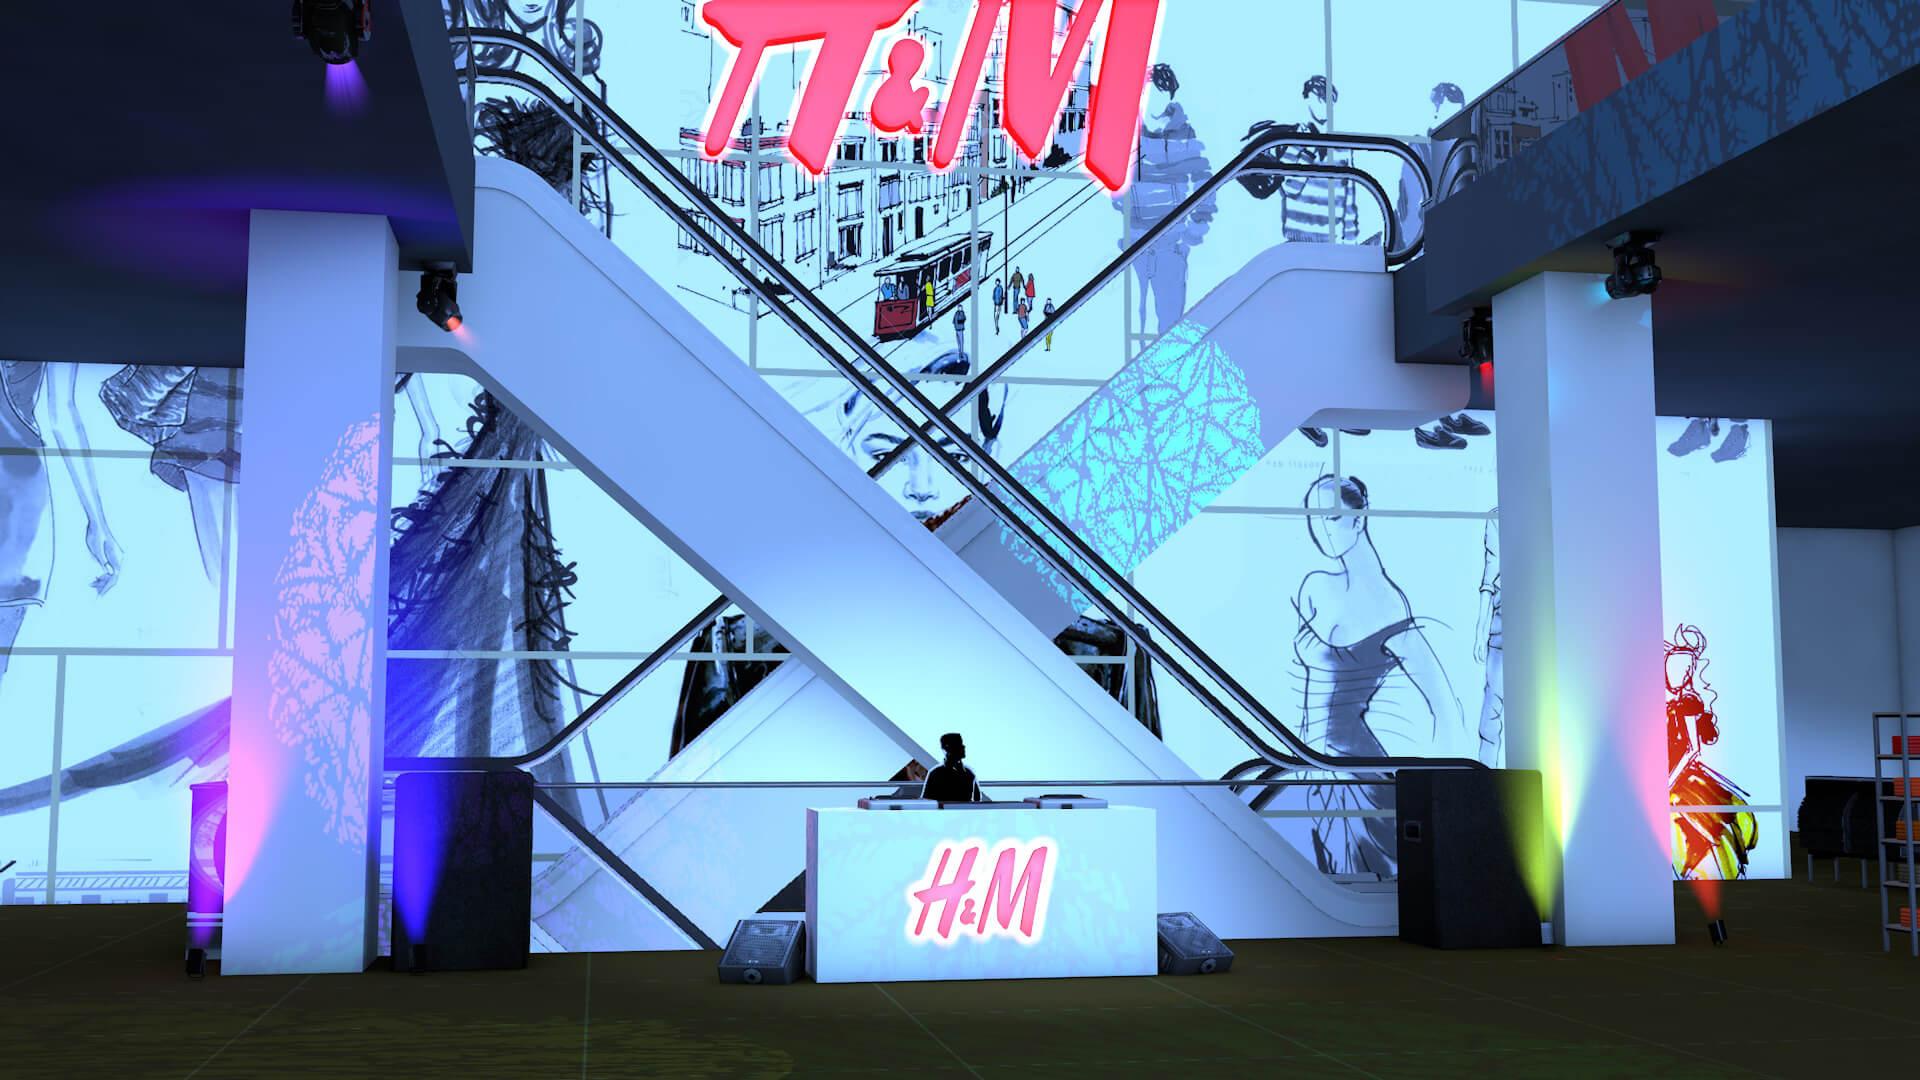 fashion expo event DJ shop and dance